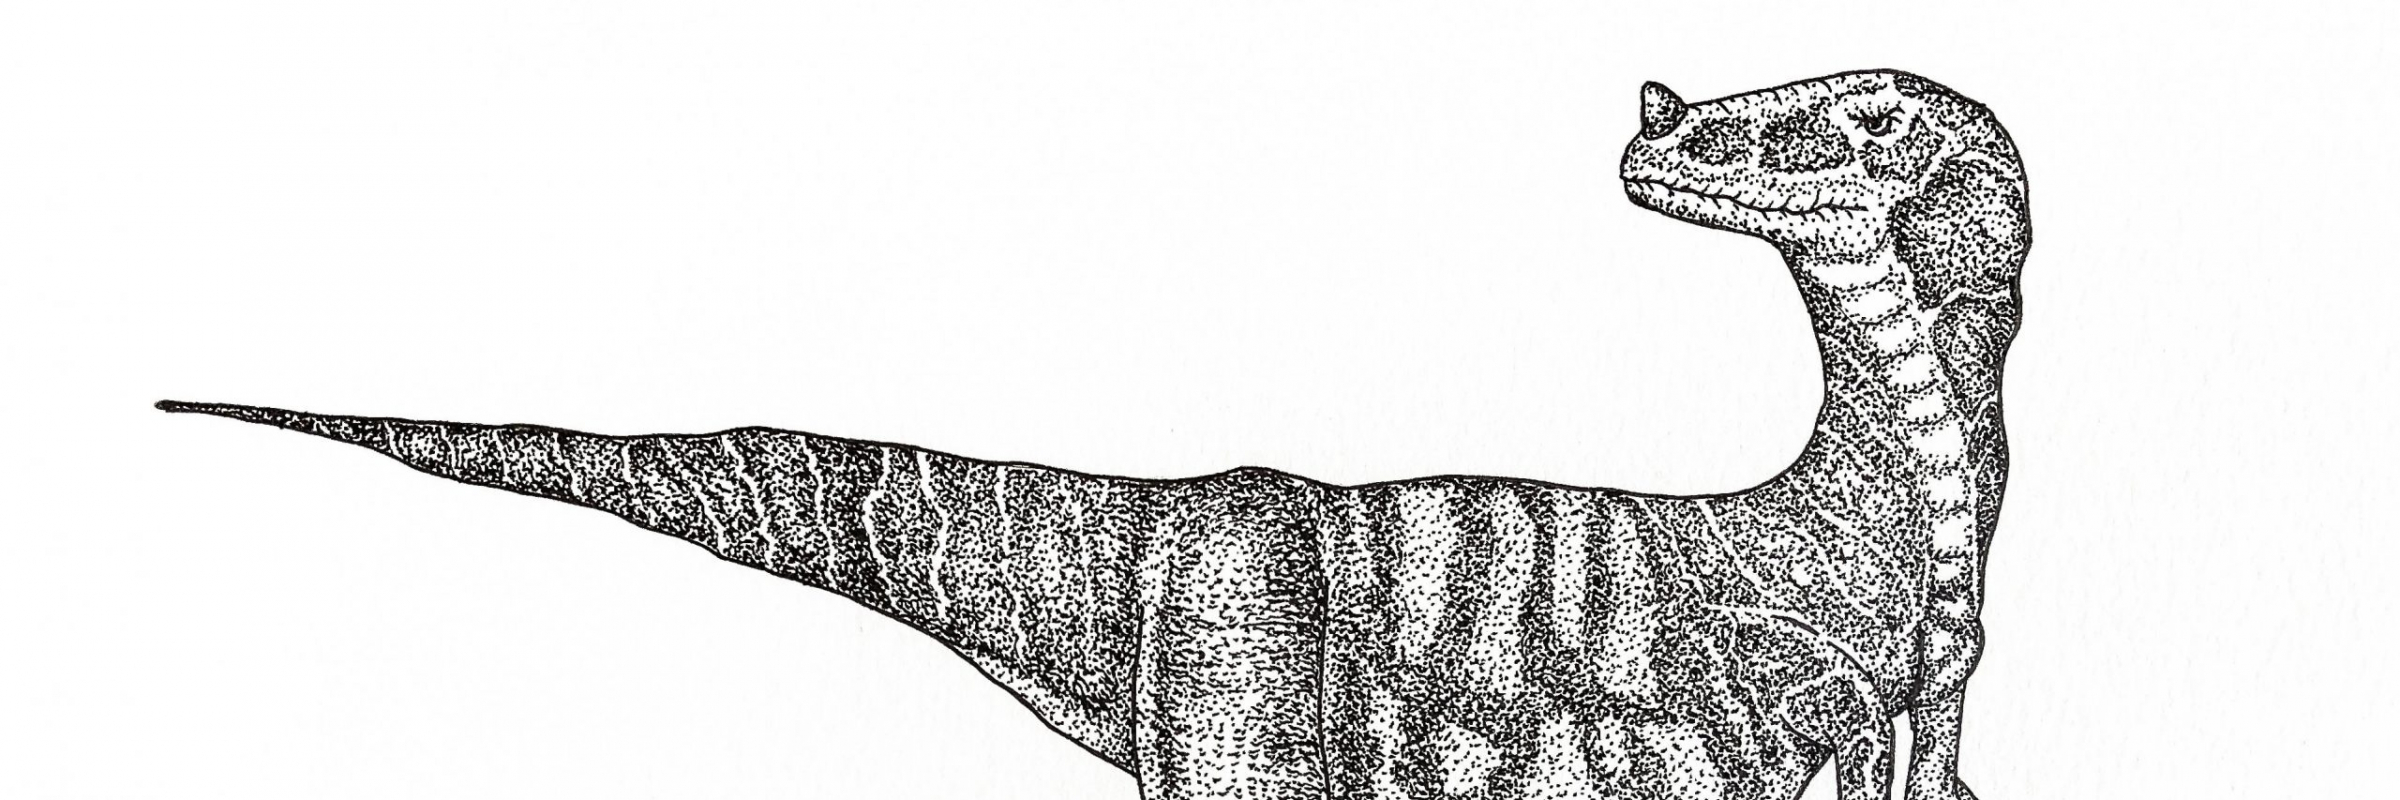 Dino Crop (1 of 1)